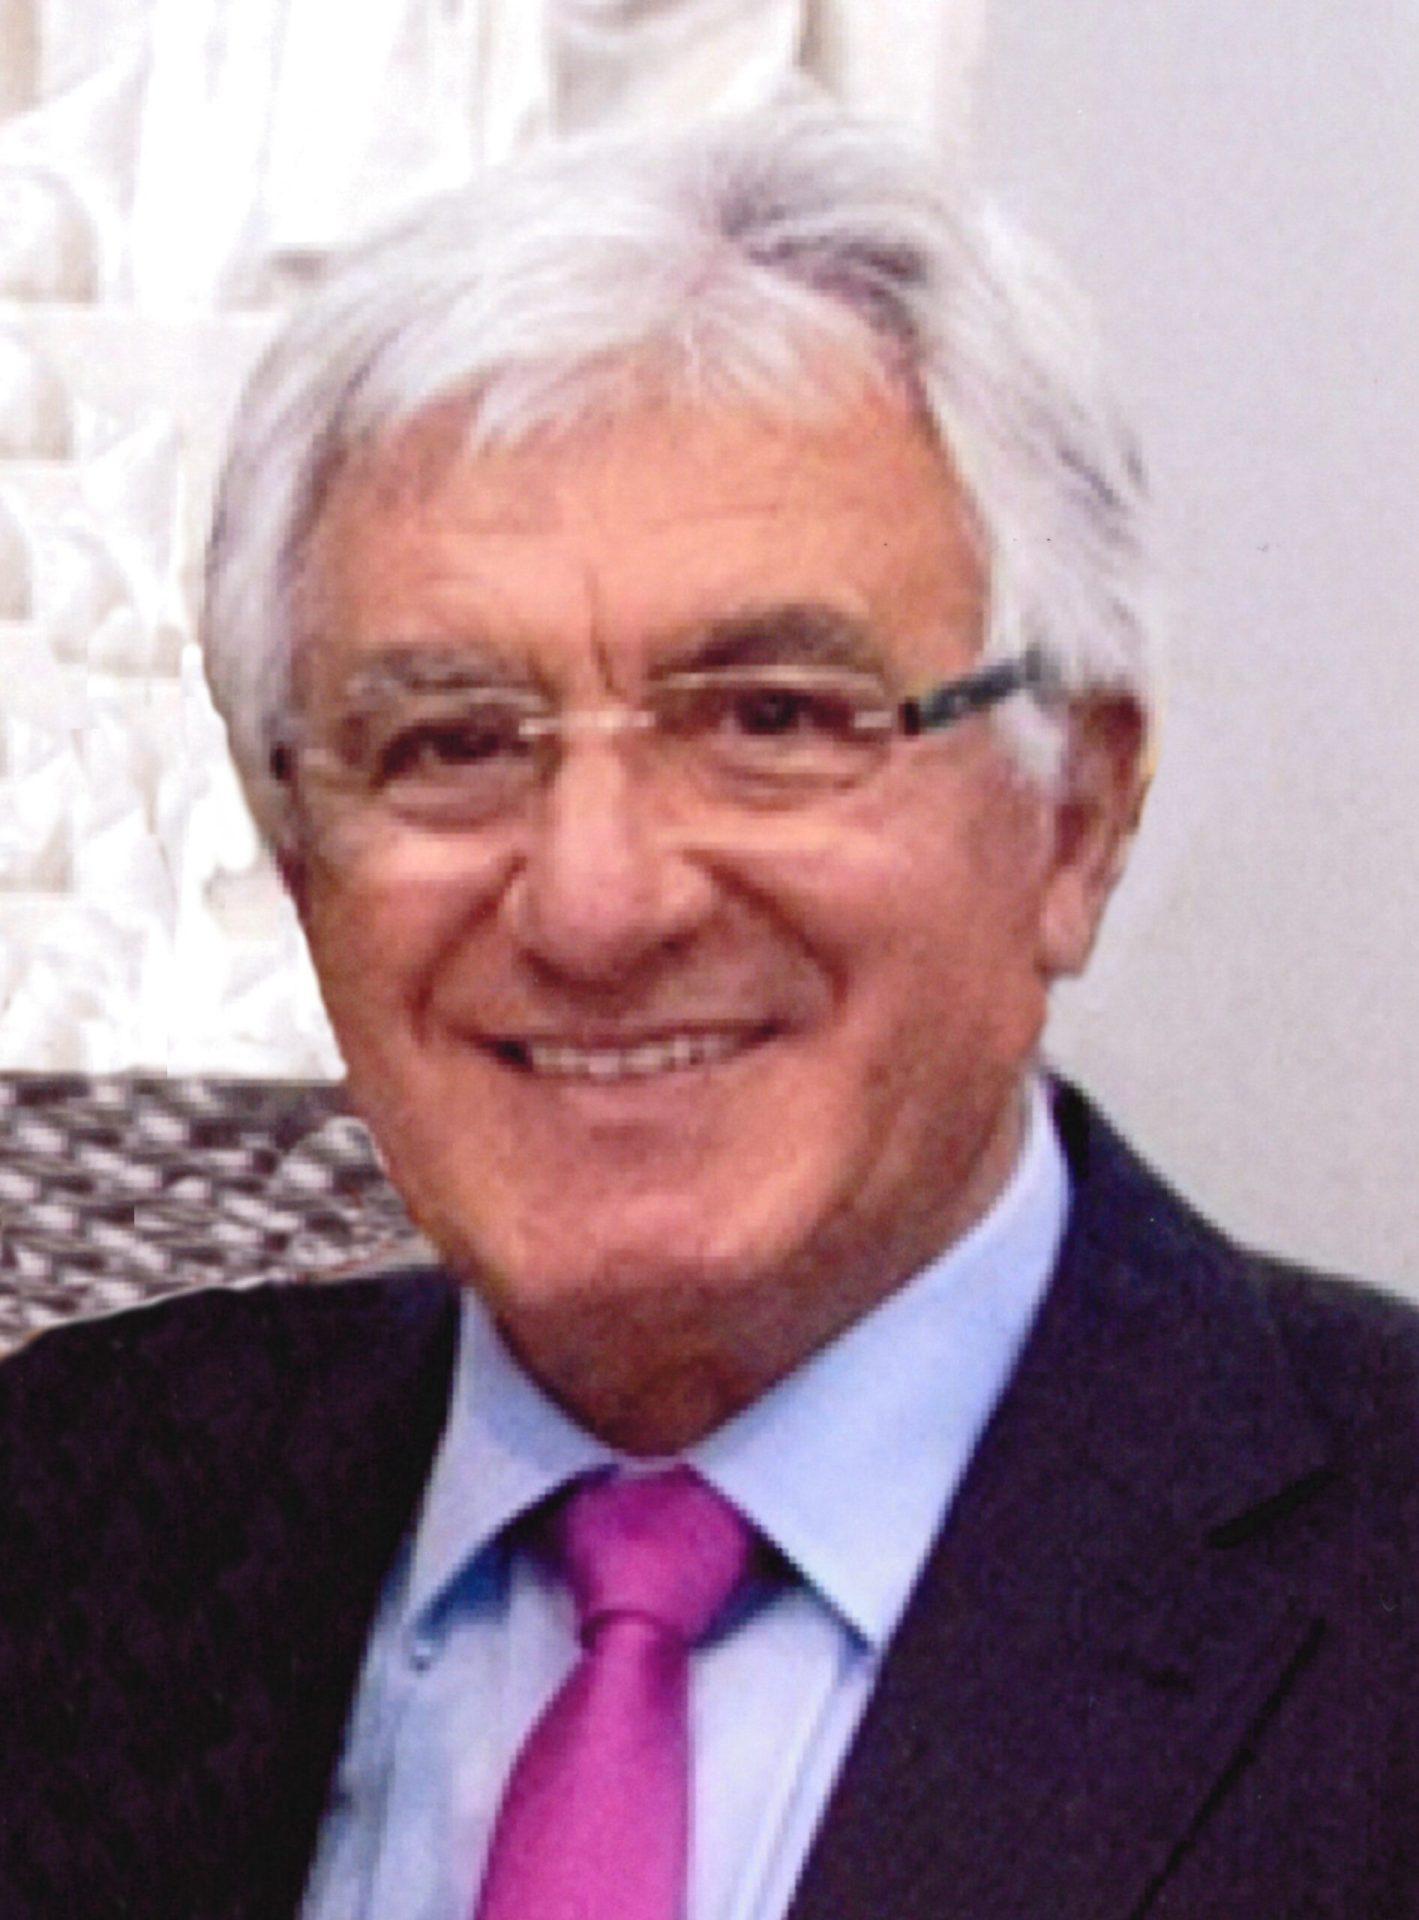 Mario Grillo